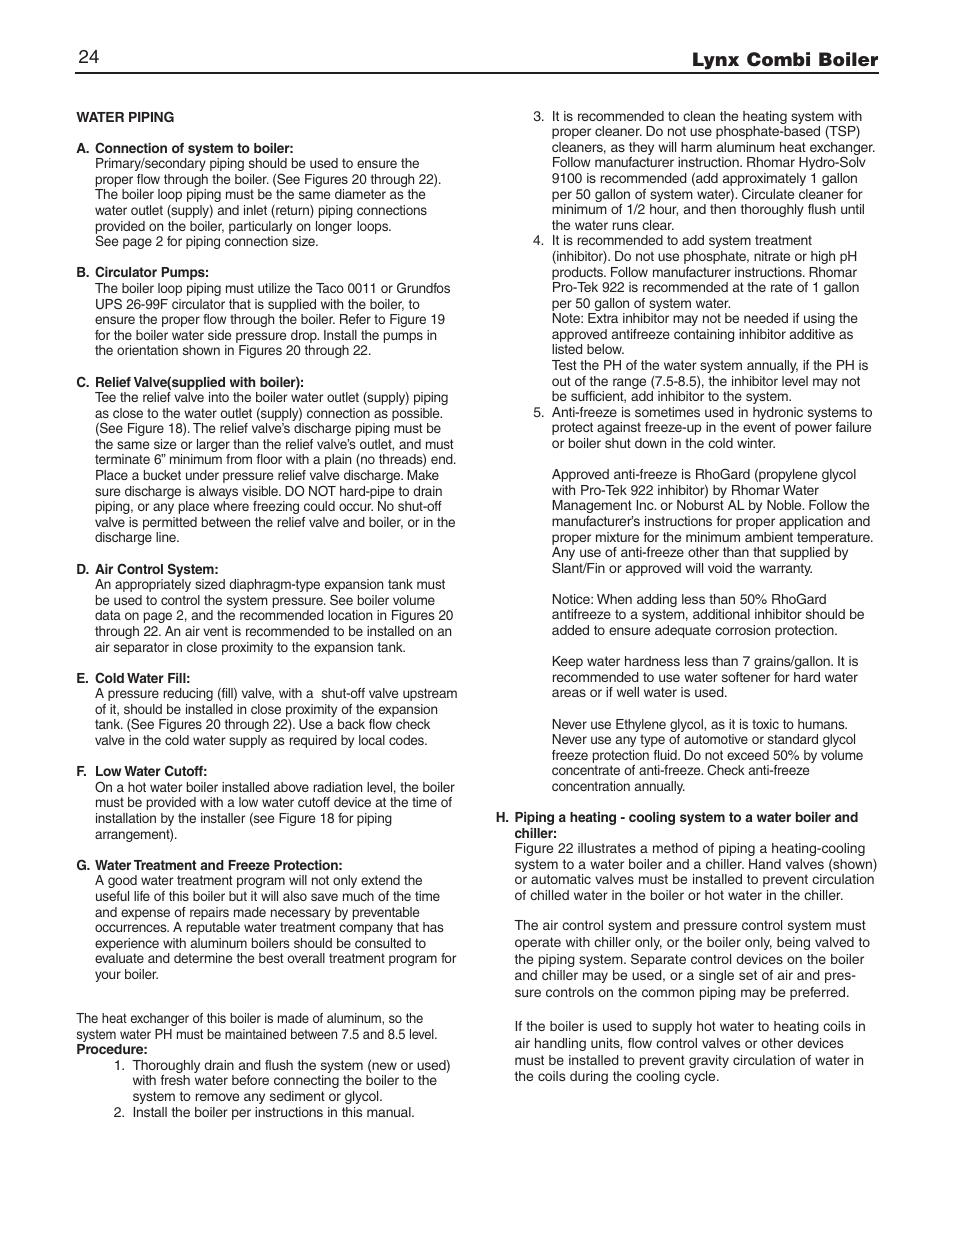 Lynx Combi Boiler 24 Slant Fin Lx 150cb User Manual Page 44 Wiring Diagram